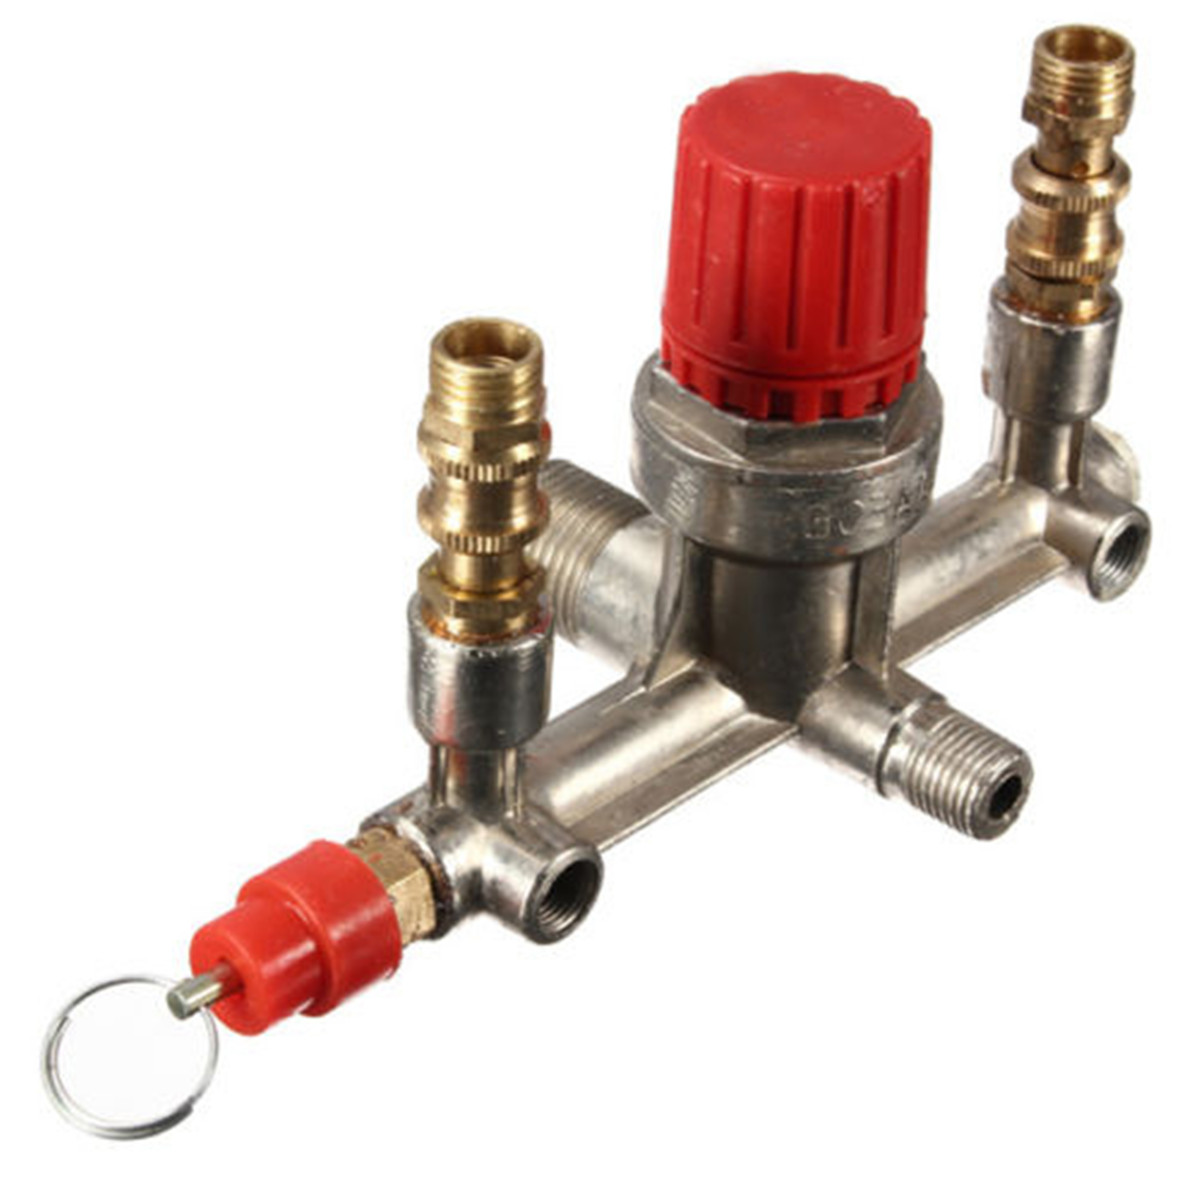 regulator heavy duty air compressor pump pressure control switch valve gaug. Black Bedroom Furniture Sets. Home Design Ideas